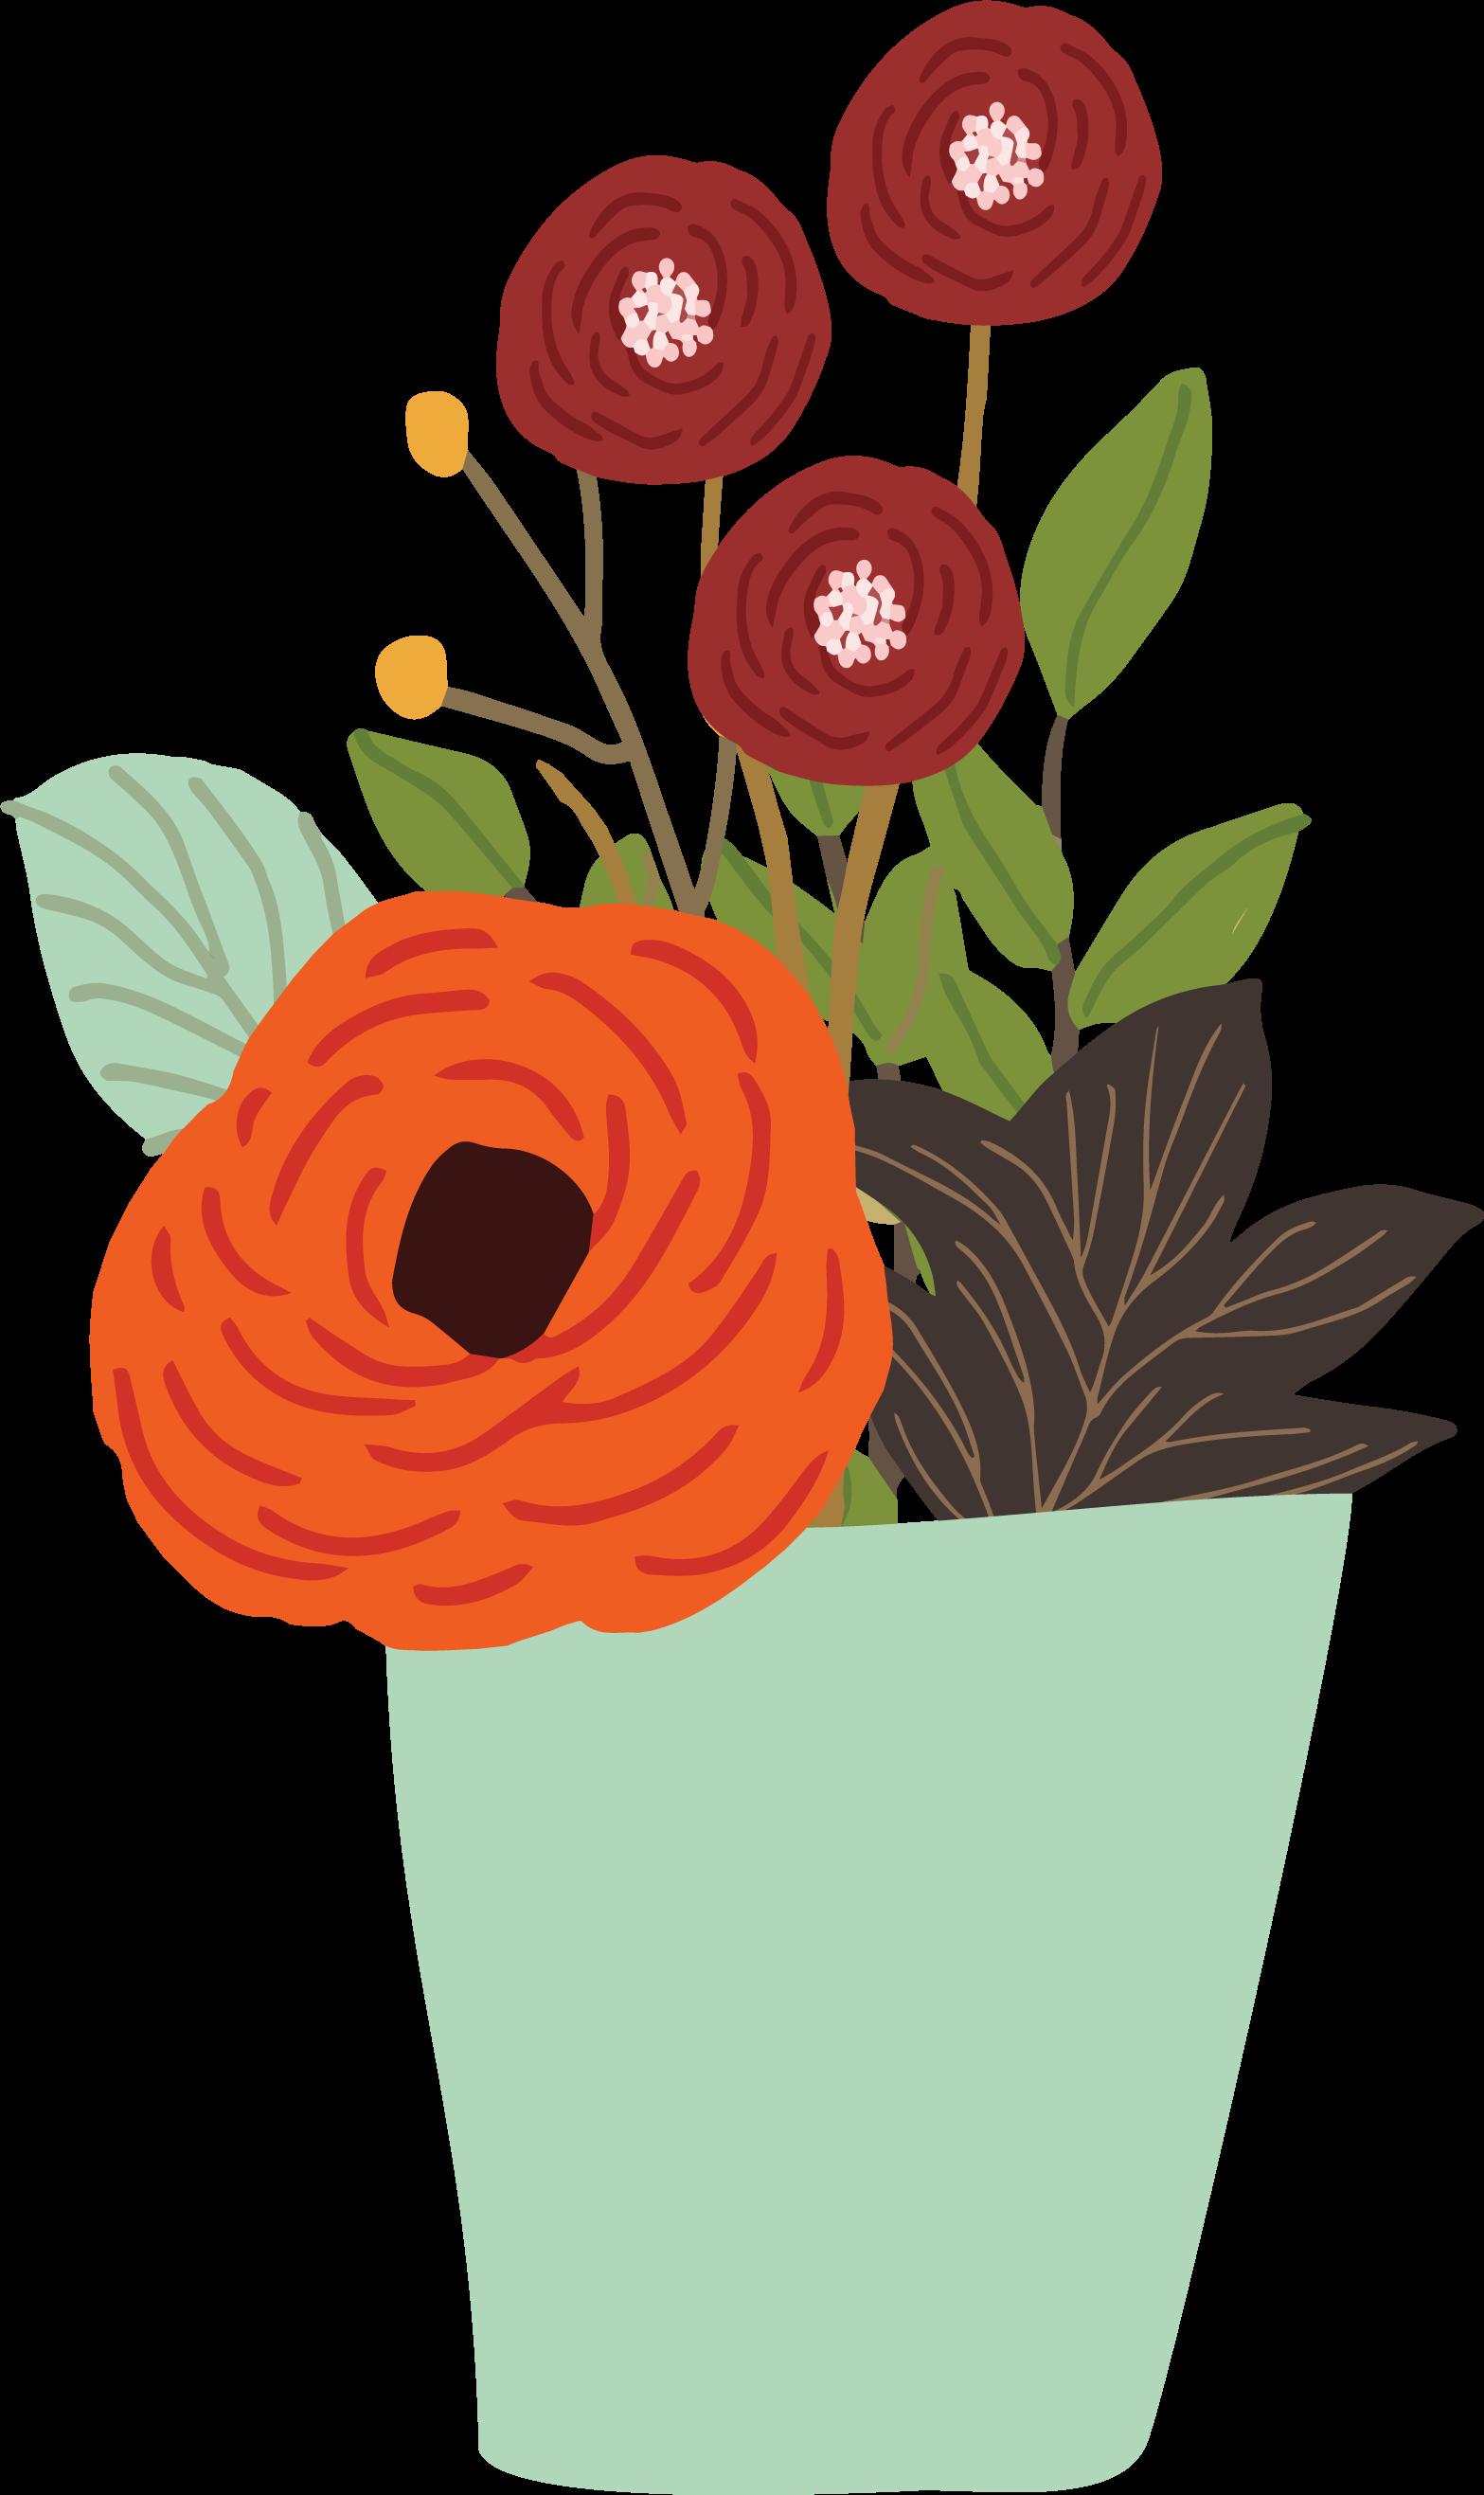 Fall Flowers Print & Cut File